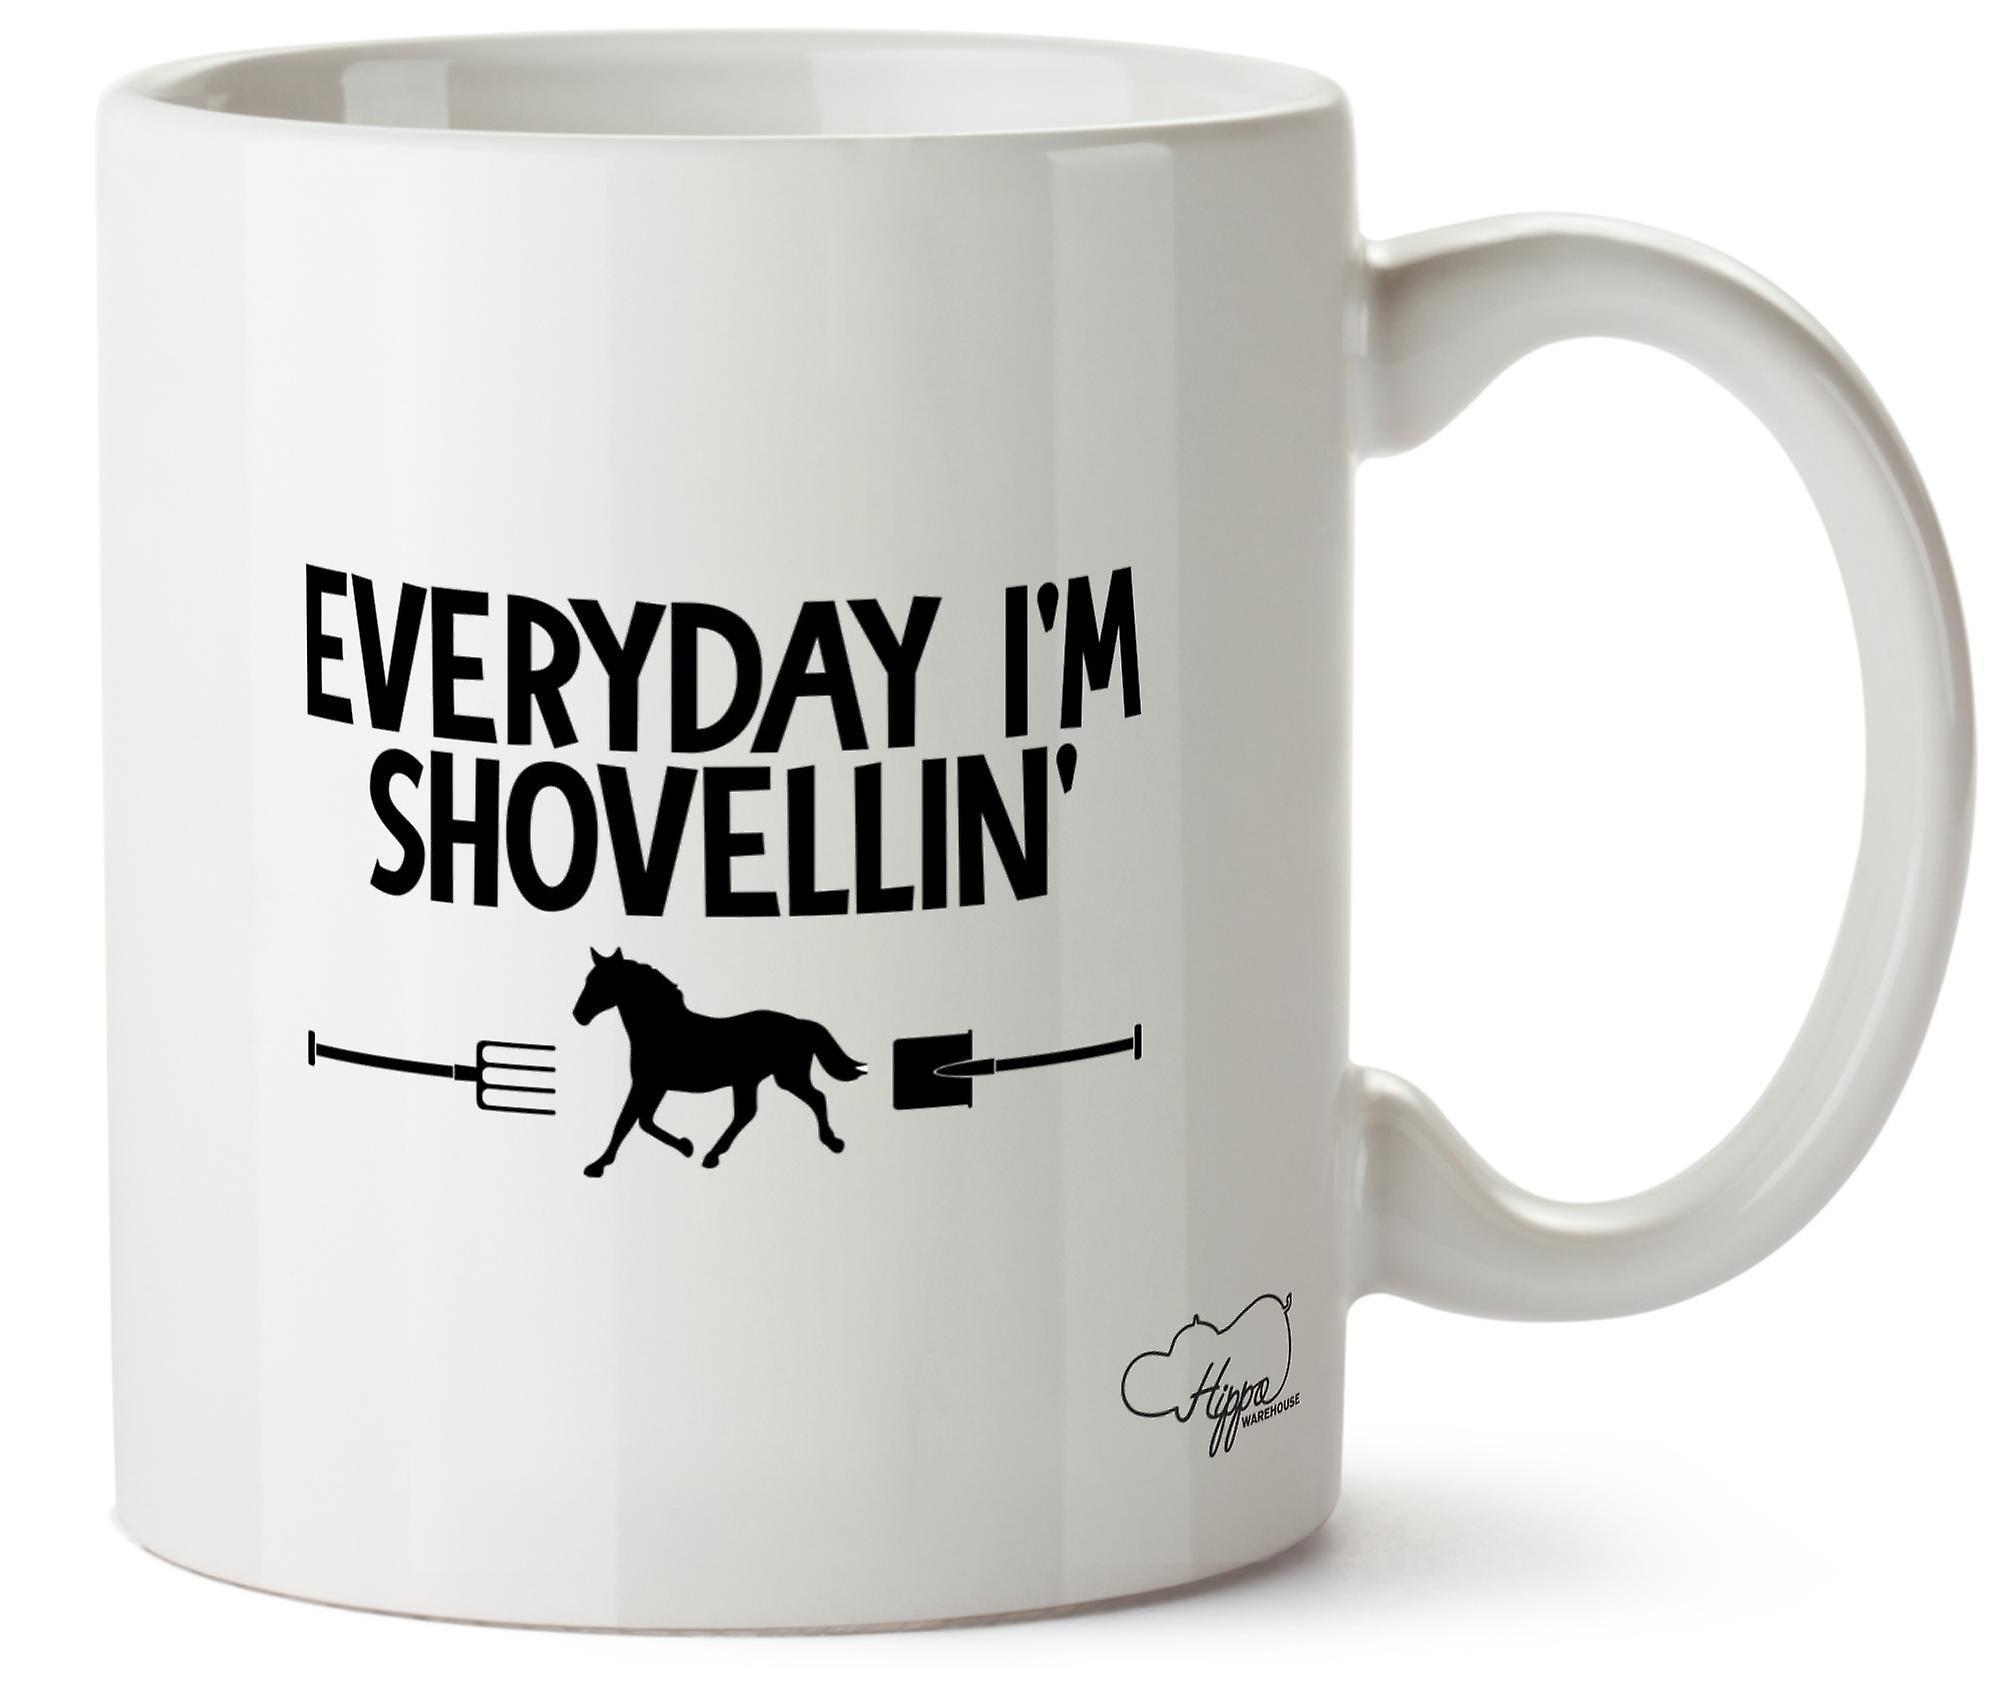 Hippowarehouse Everyday I'm Shovellin' Horse Riding Printed Mug Cup Ceramic 10oz